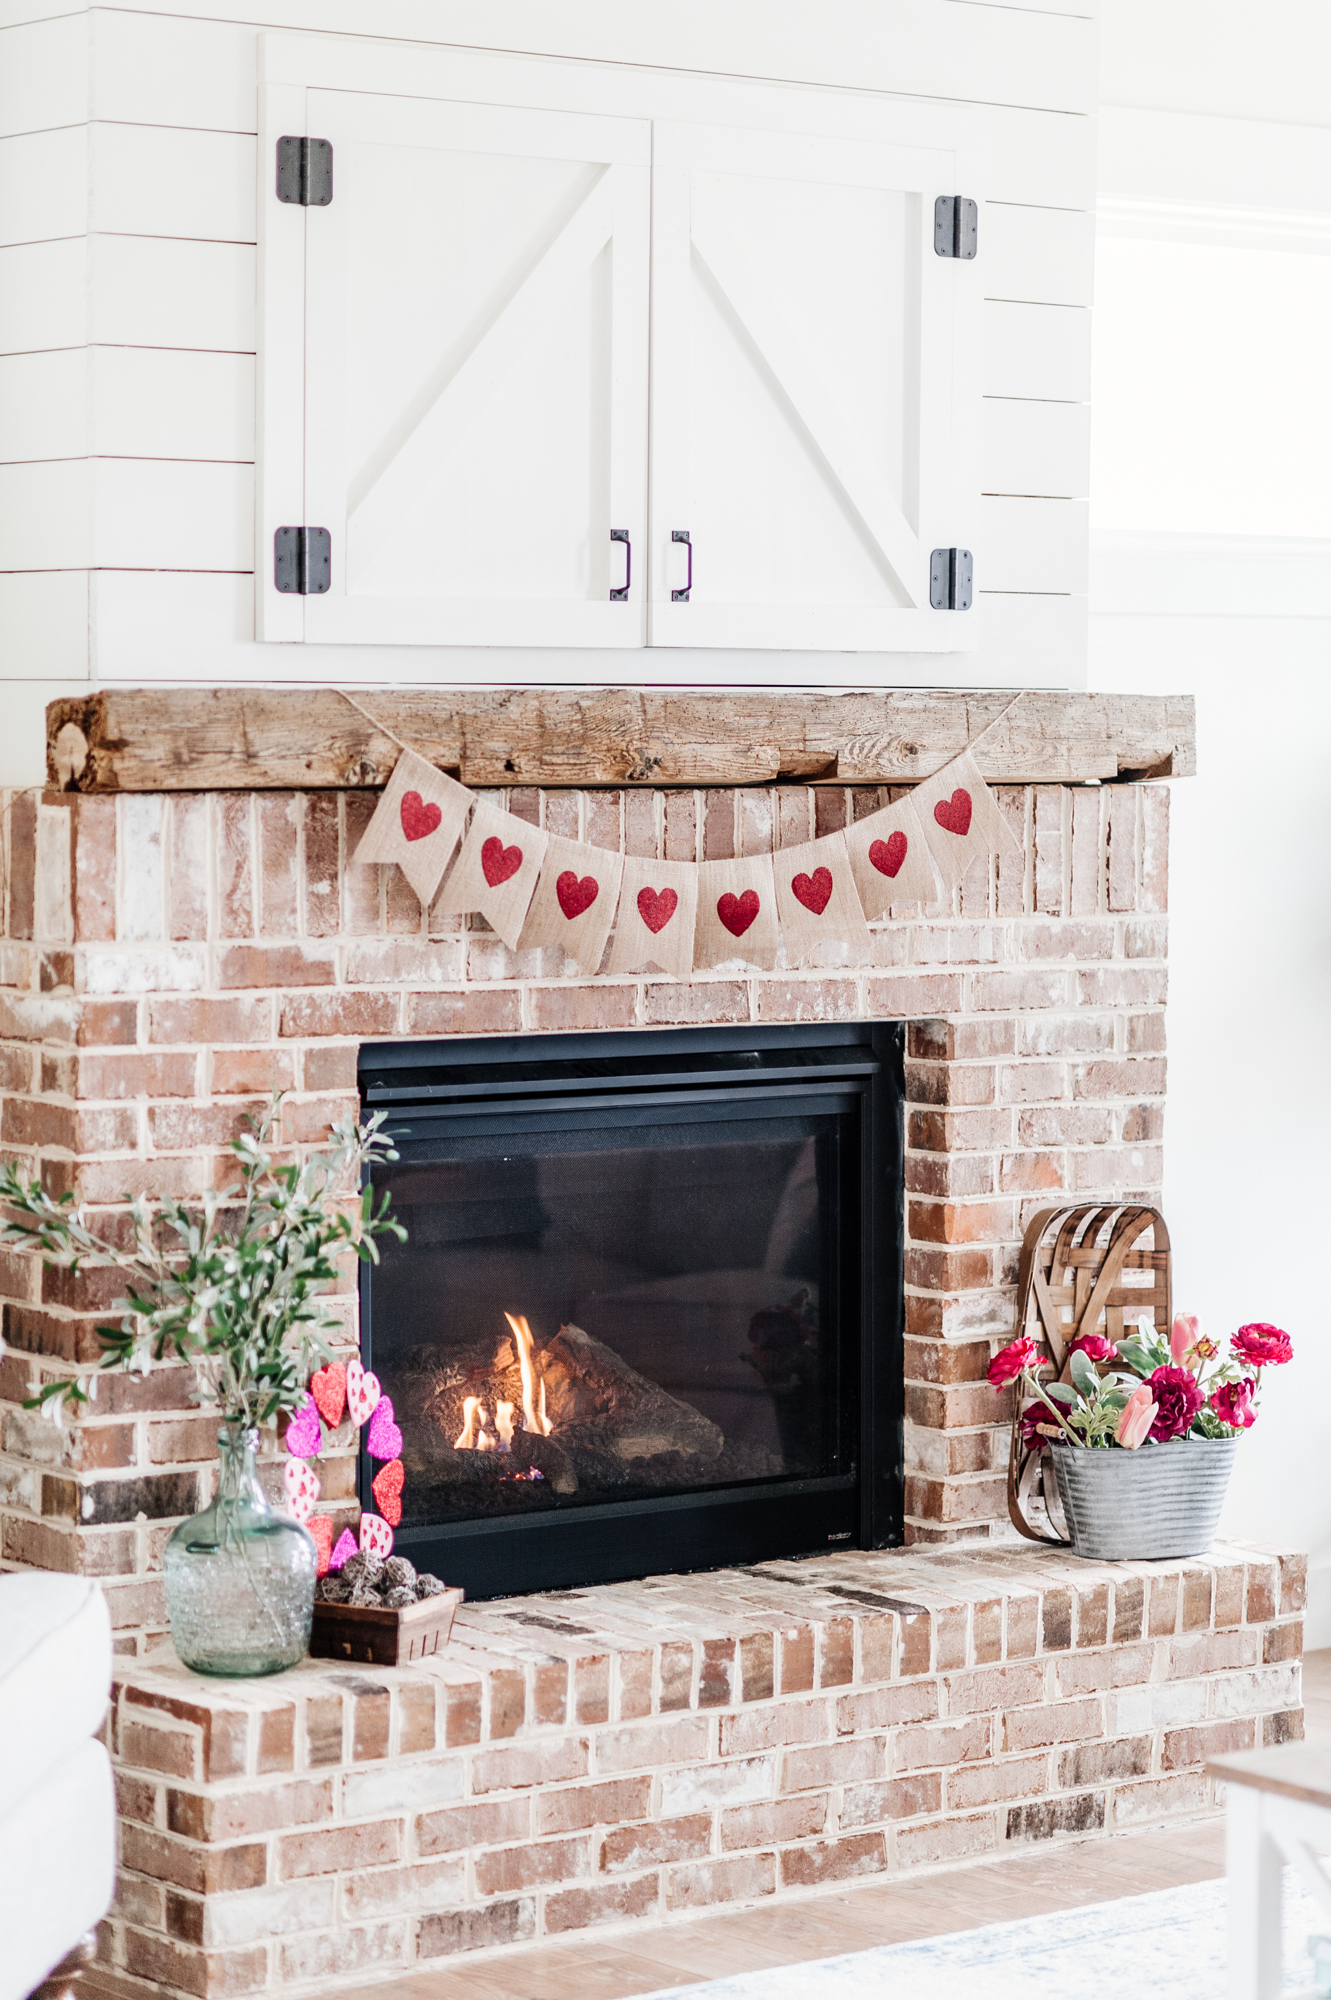 simplistic farmhouse decor for Valentine's Day   kristinpeddicord.com